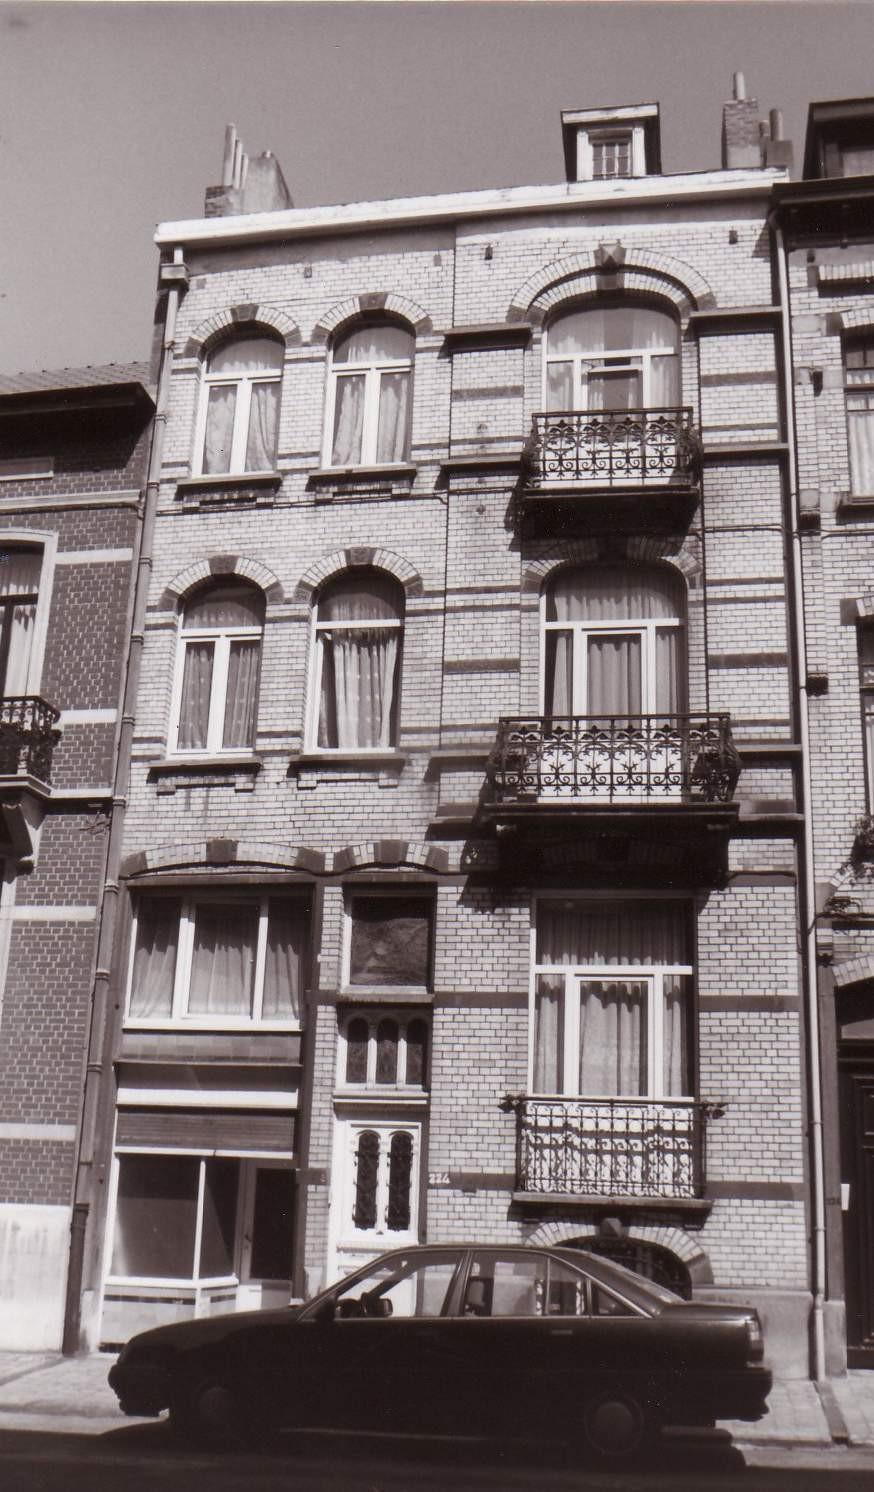 Rue Louis Hap 224., 1993